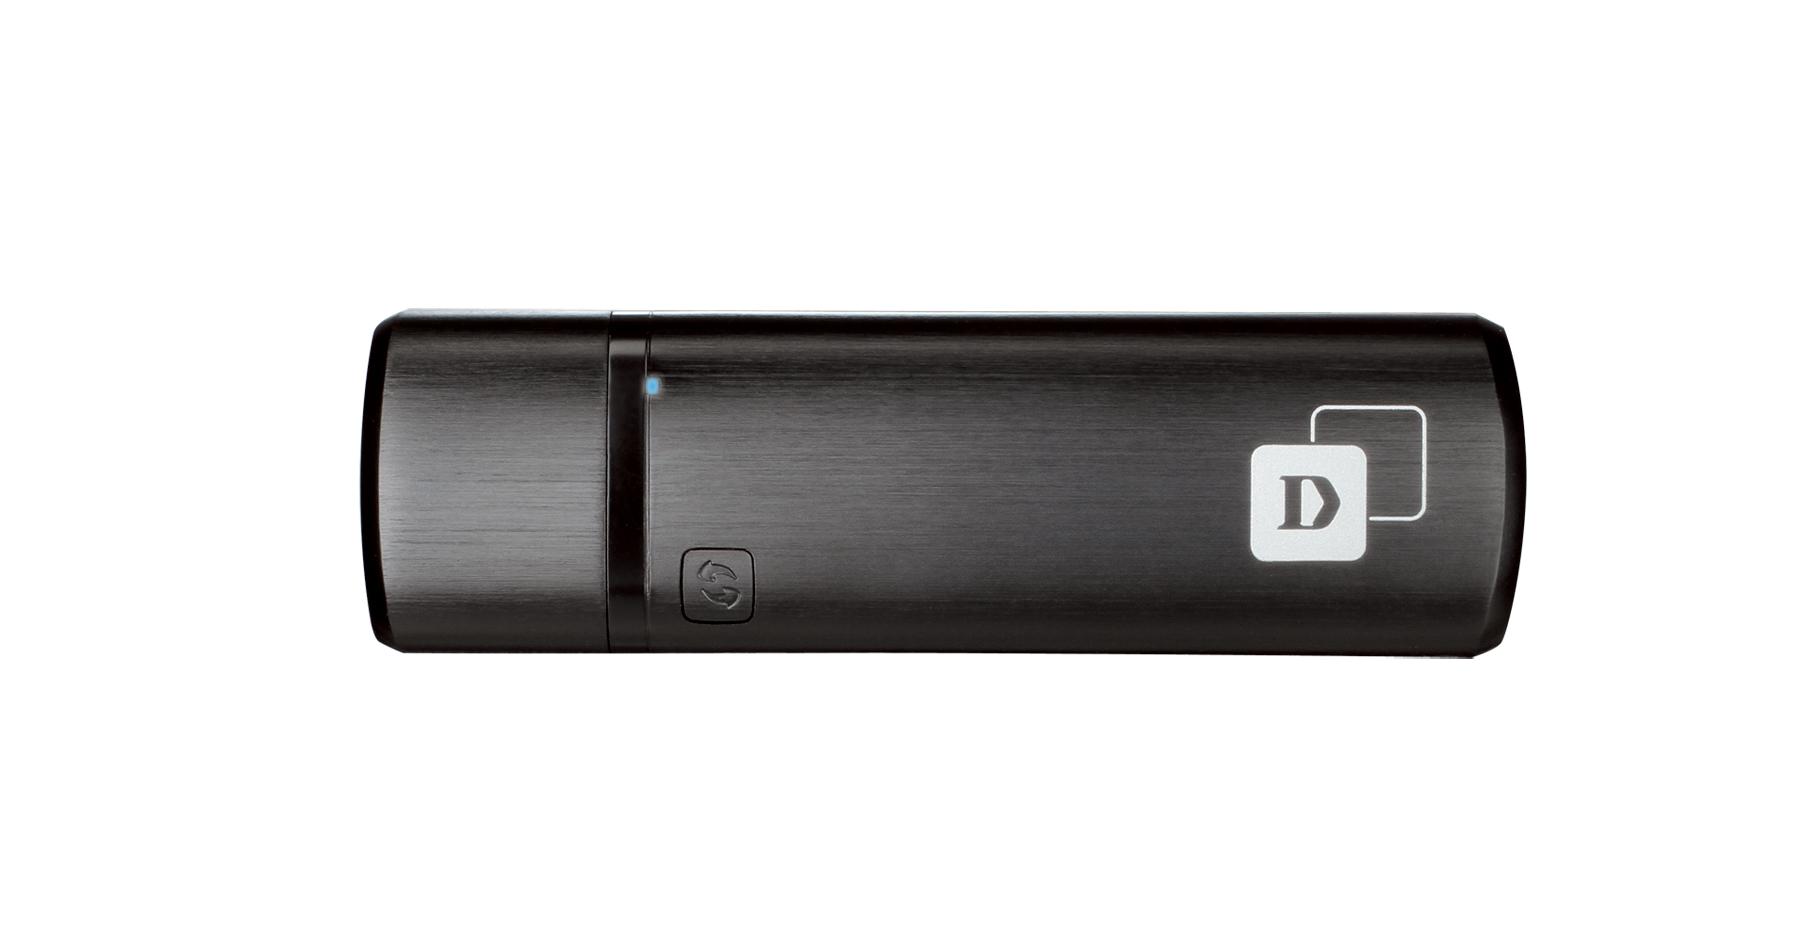 D-Link DWA-182 Wireless AC Dualband USB Adapter